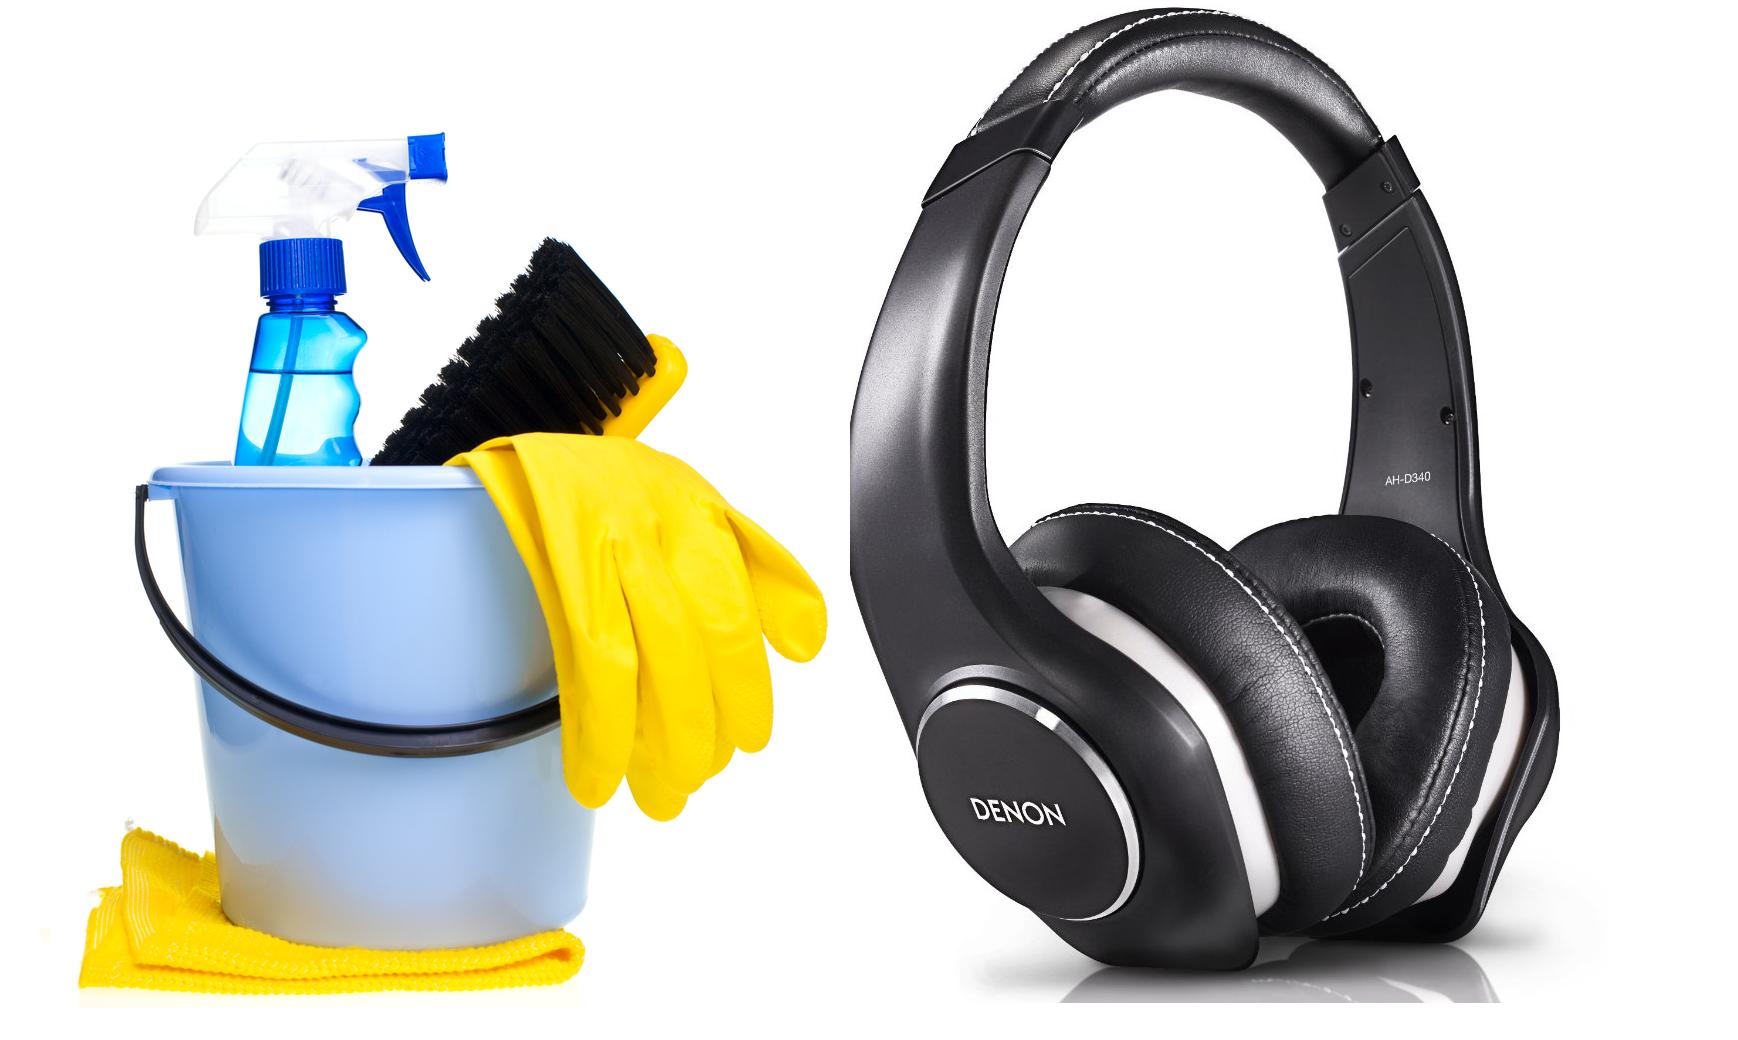 How to clean headphones